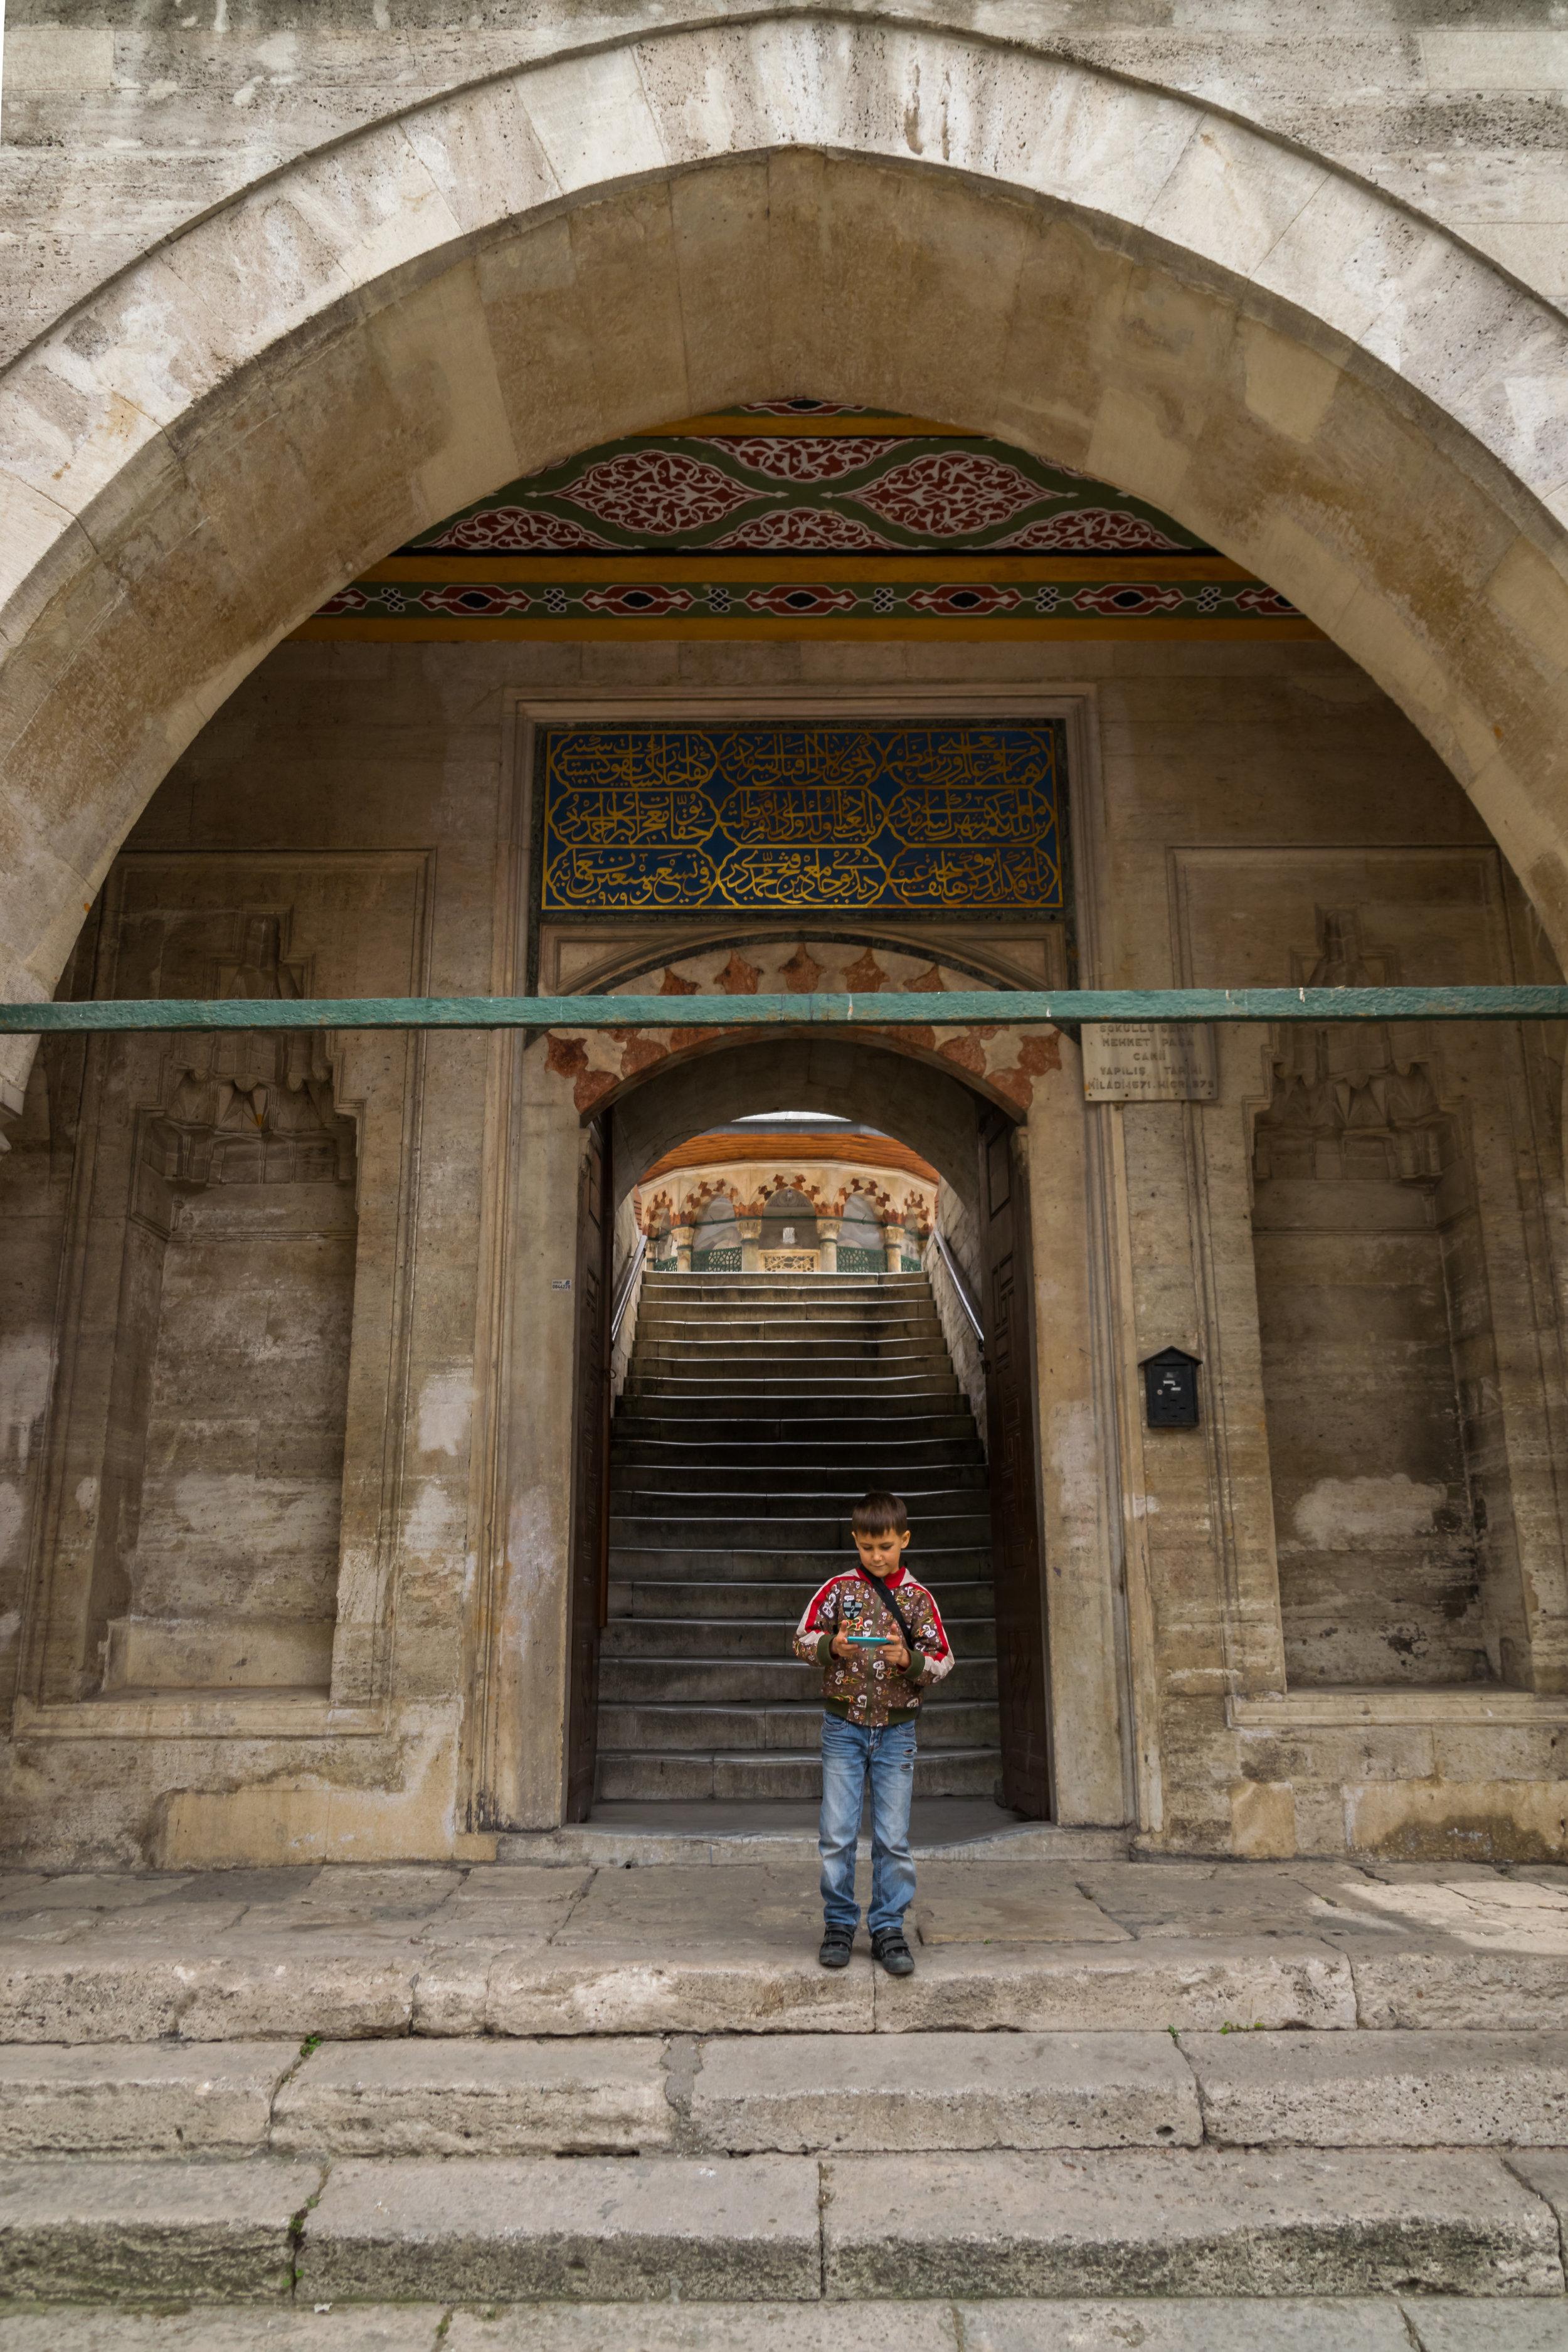 Istanbul UNESCO_Sokollu Mehmet Pasha Mosque-3.jpg